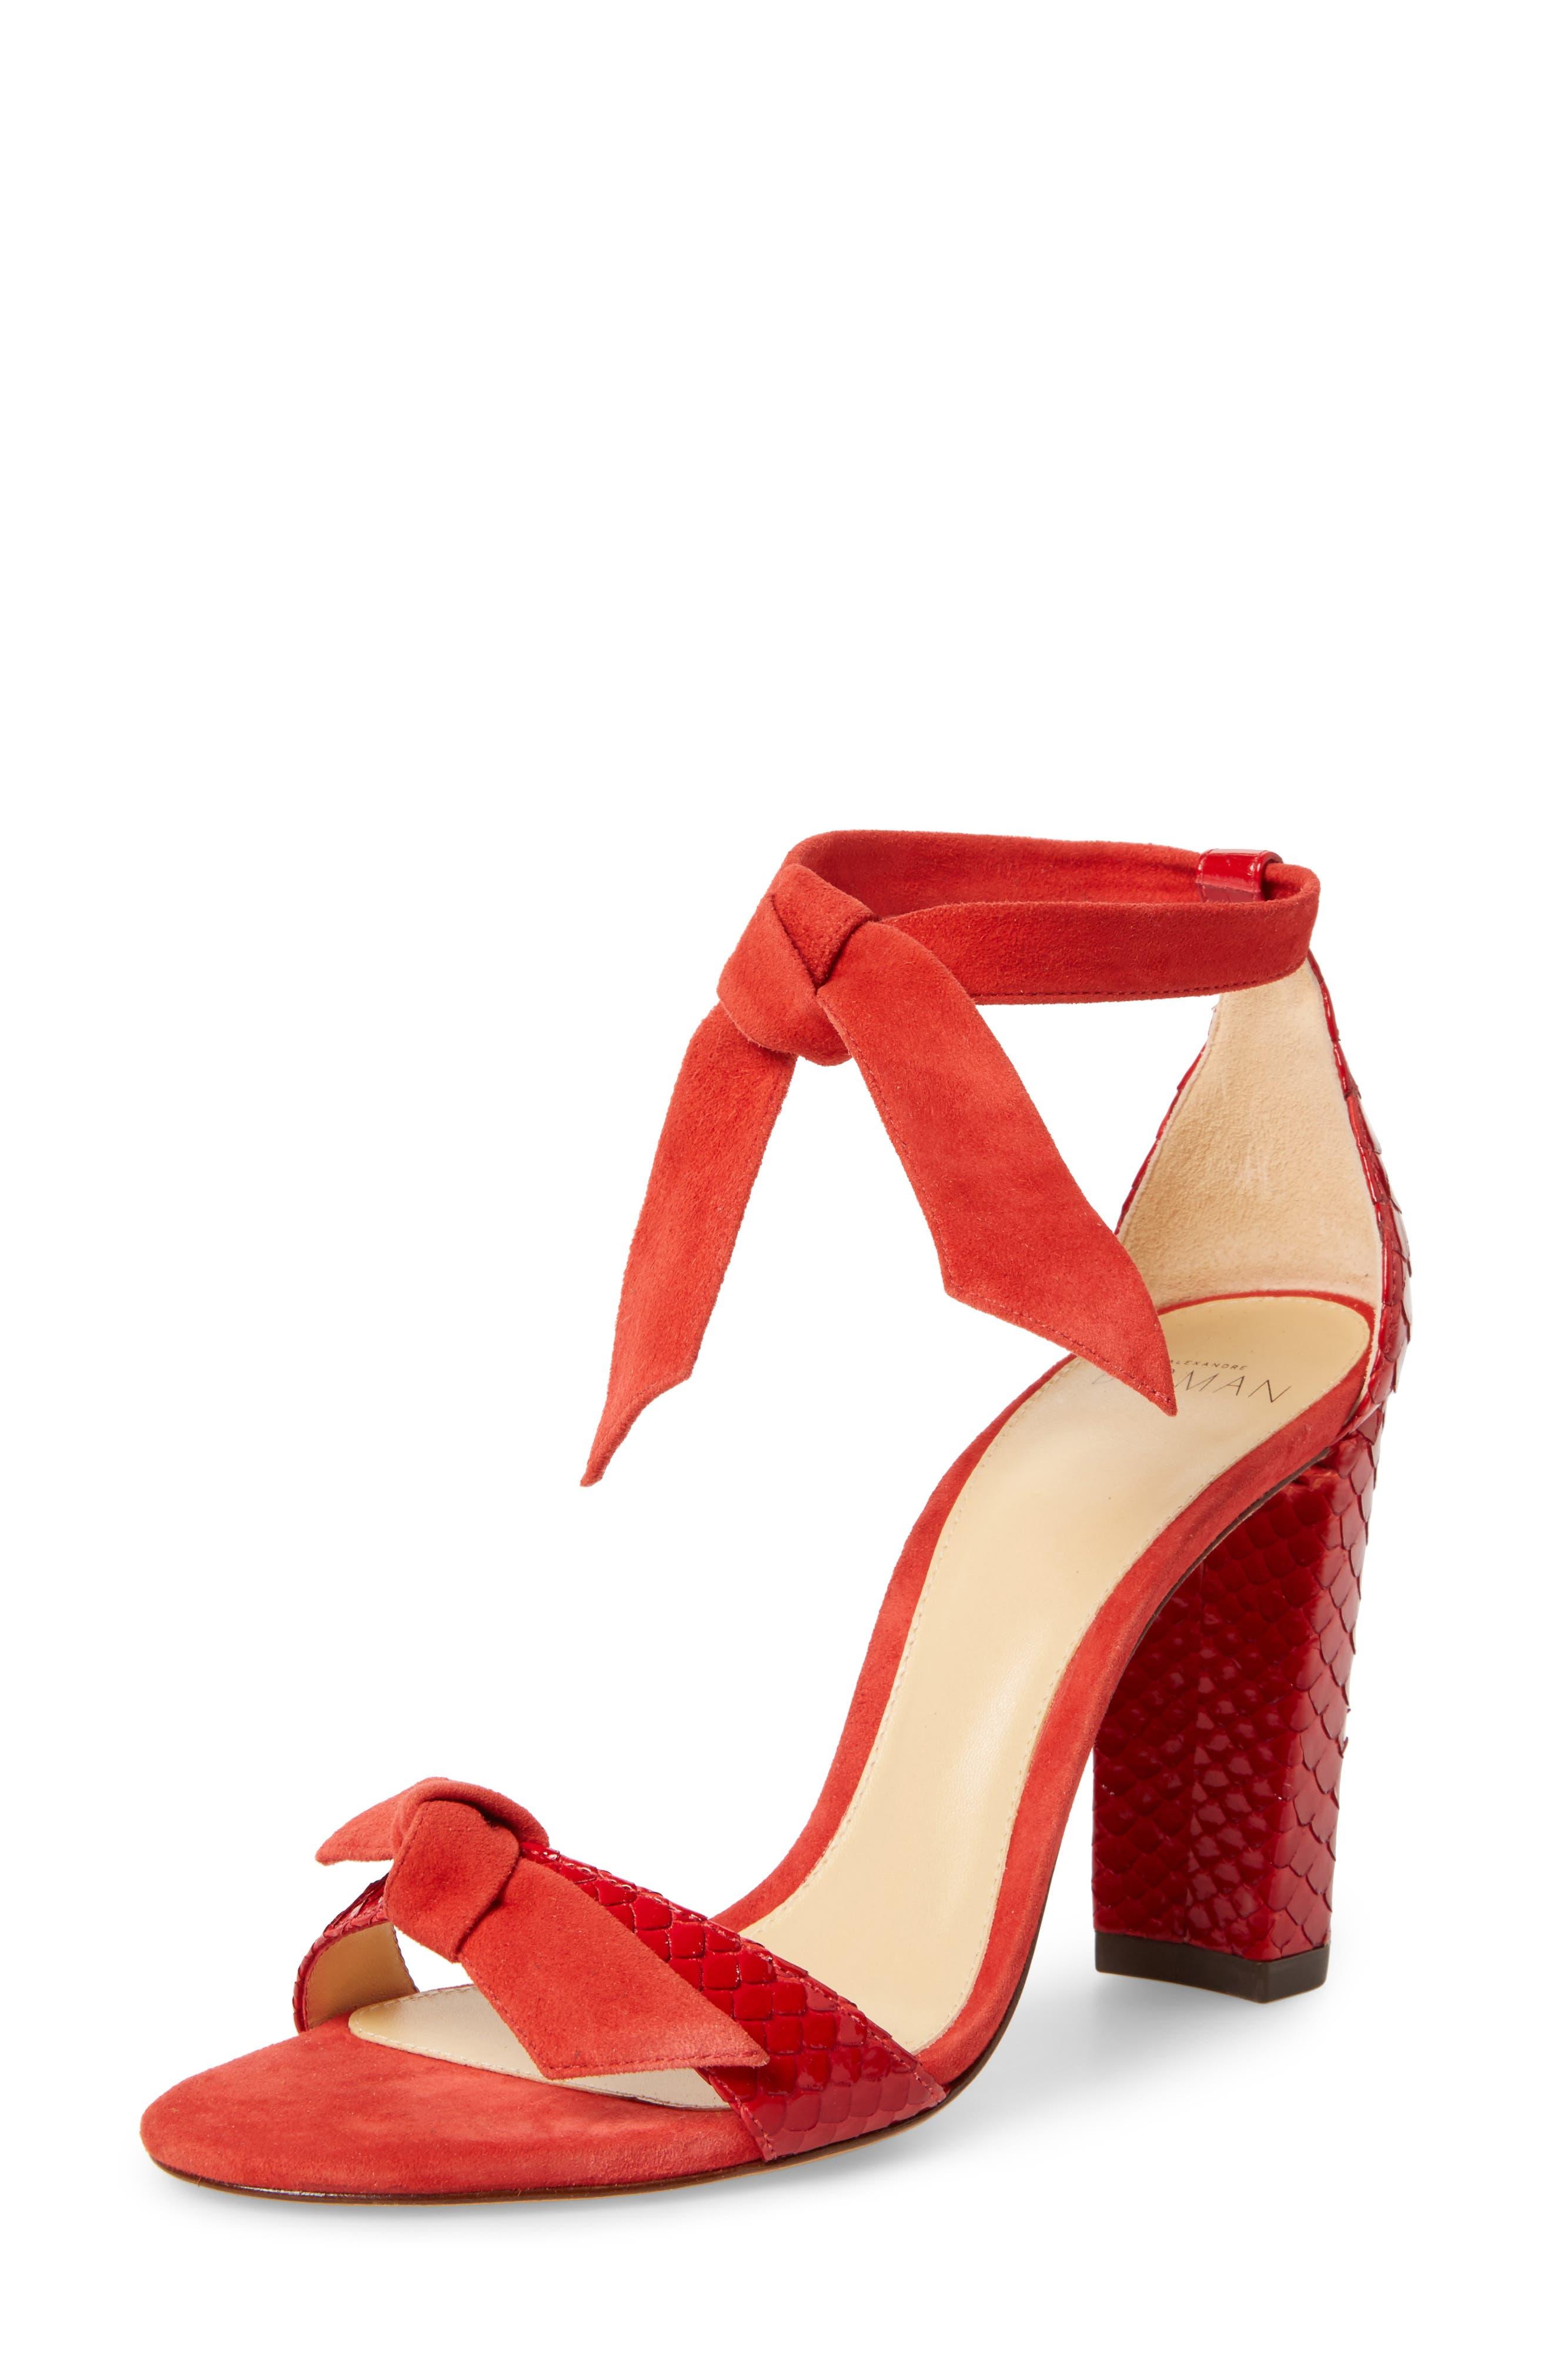 Clarita Genuine Python Ankle Tie Sandal,                             Main thumbnail 1, color,                             600